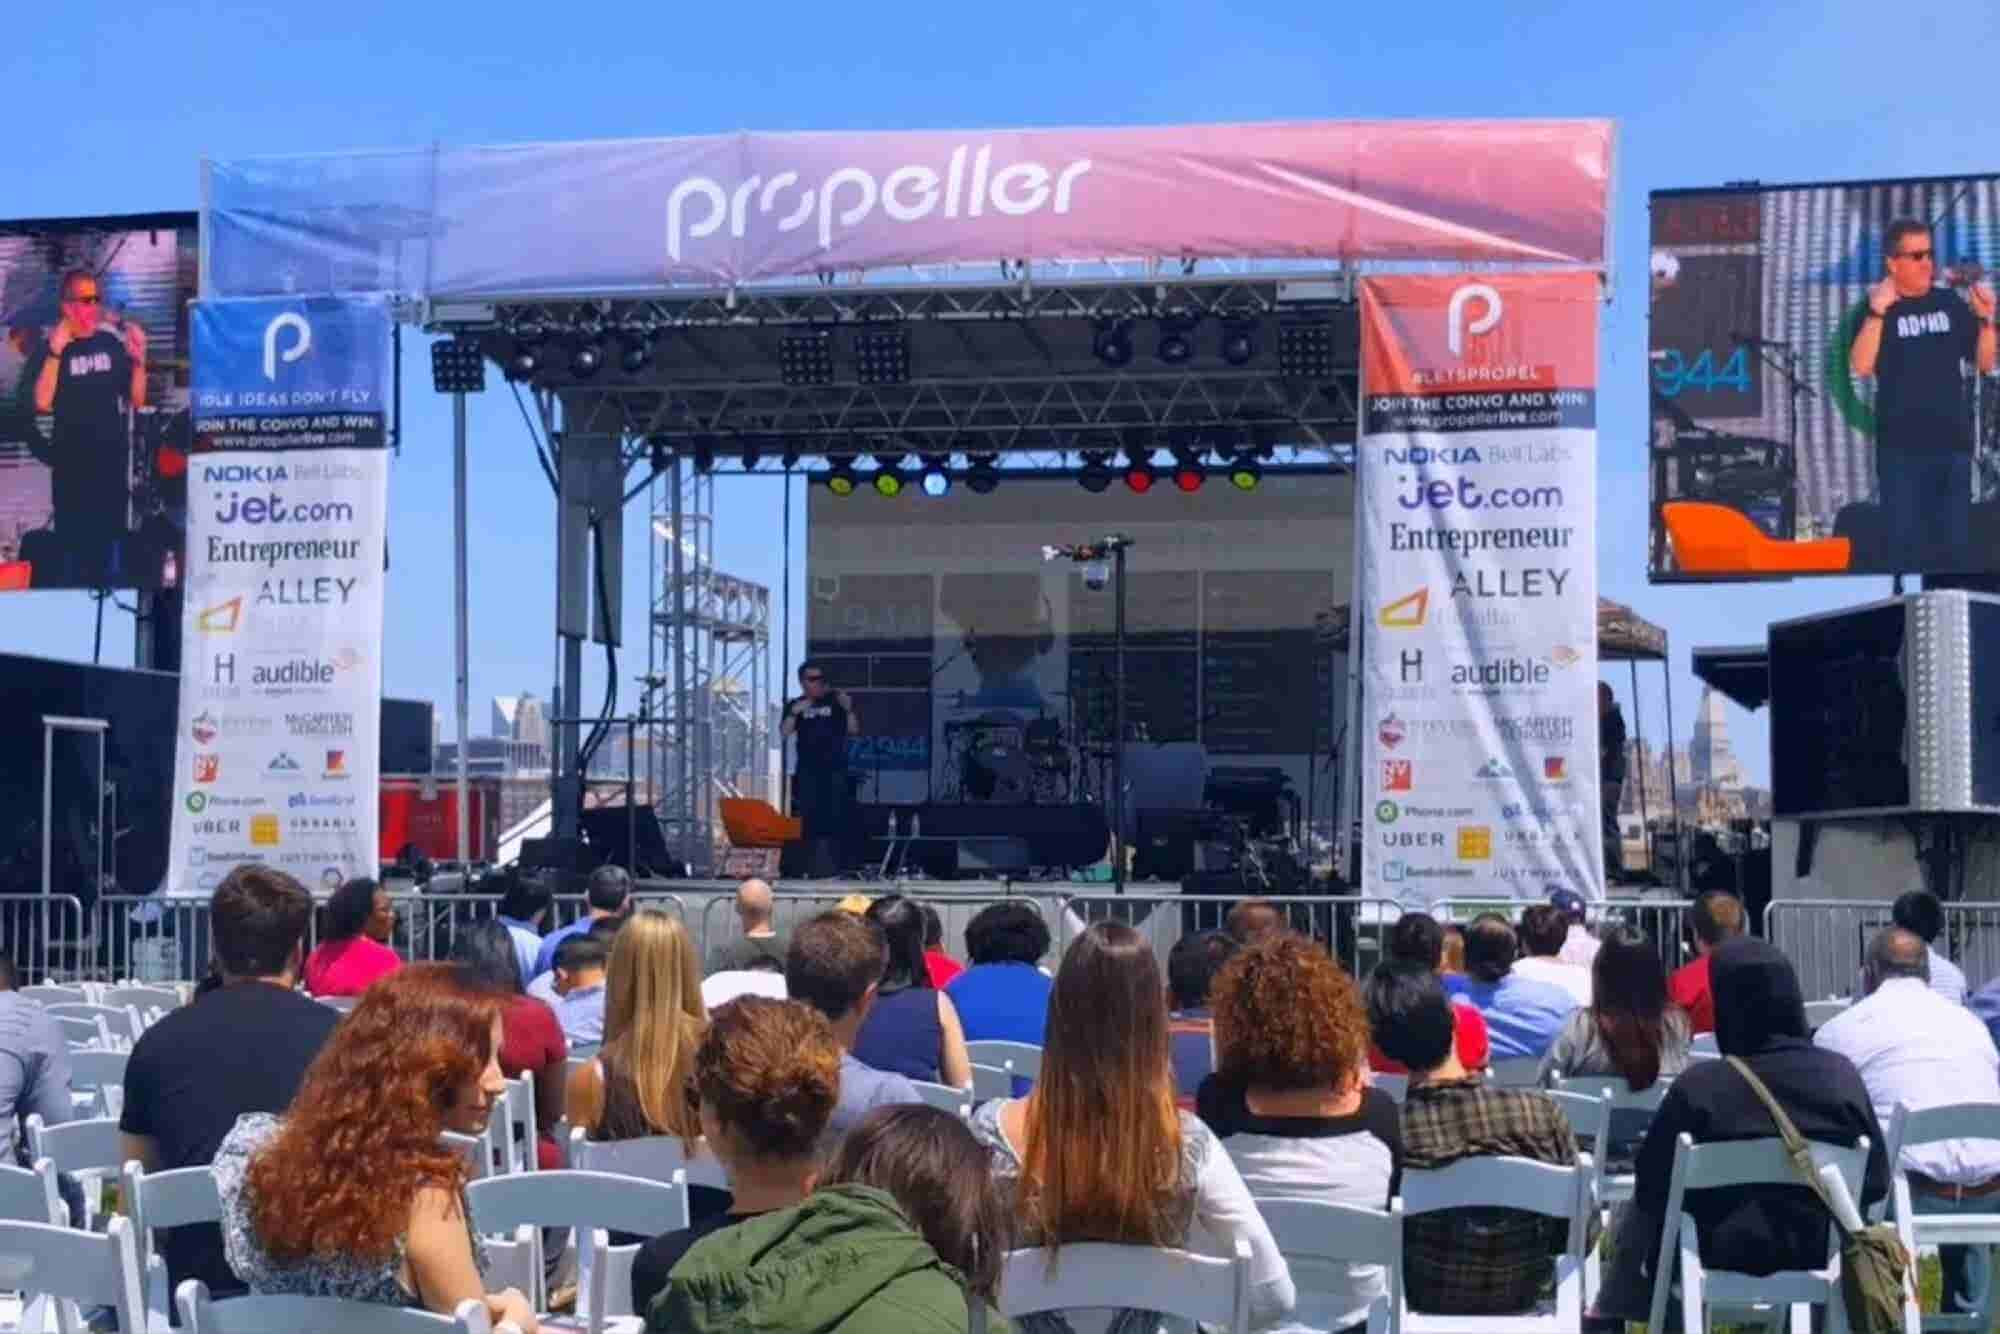 Propeller Festival 2016: Ben Angel Recaps Moments of Inspiration, Innovation